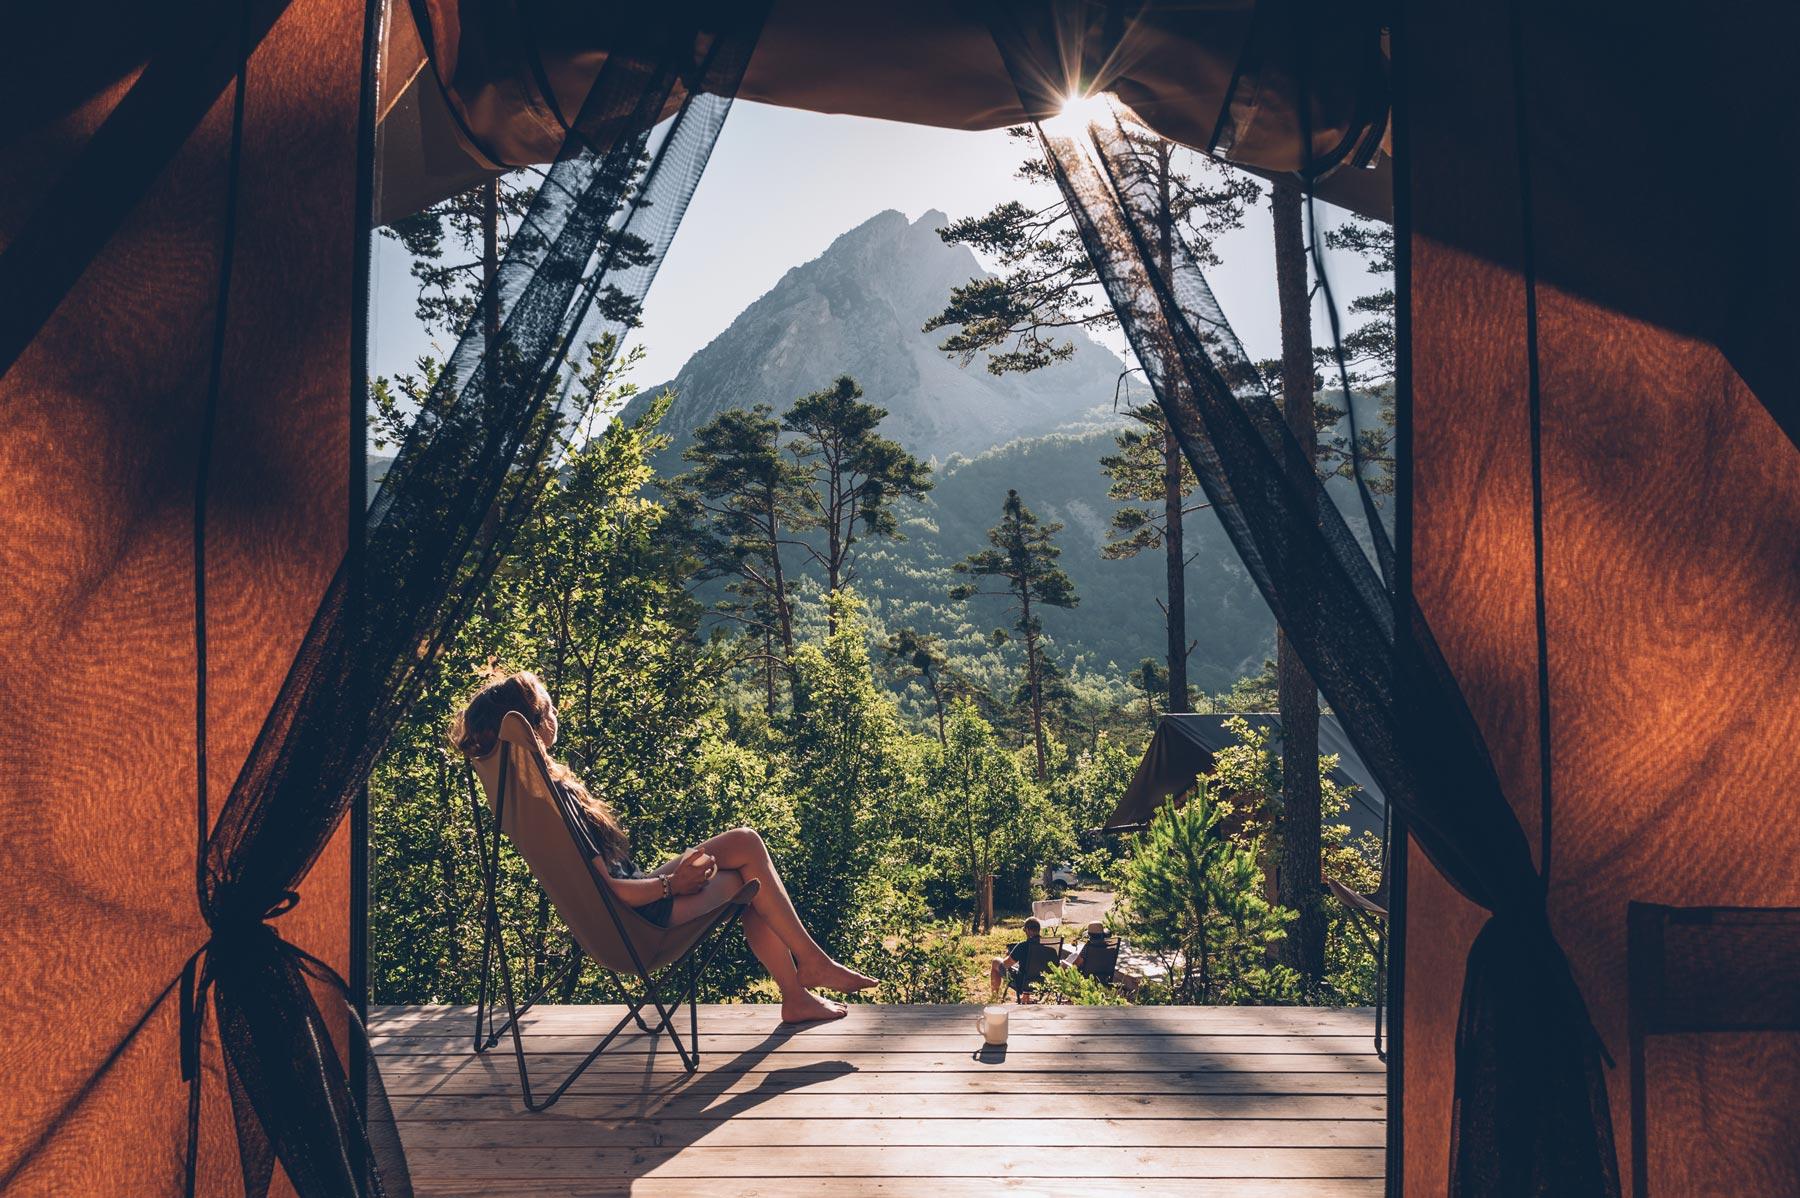 Camping Huttopia, Gorges du Verdon